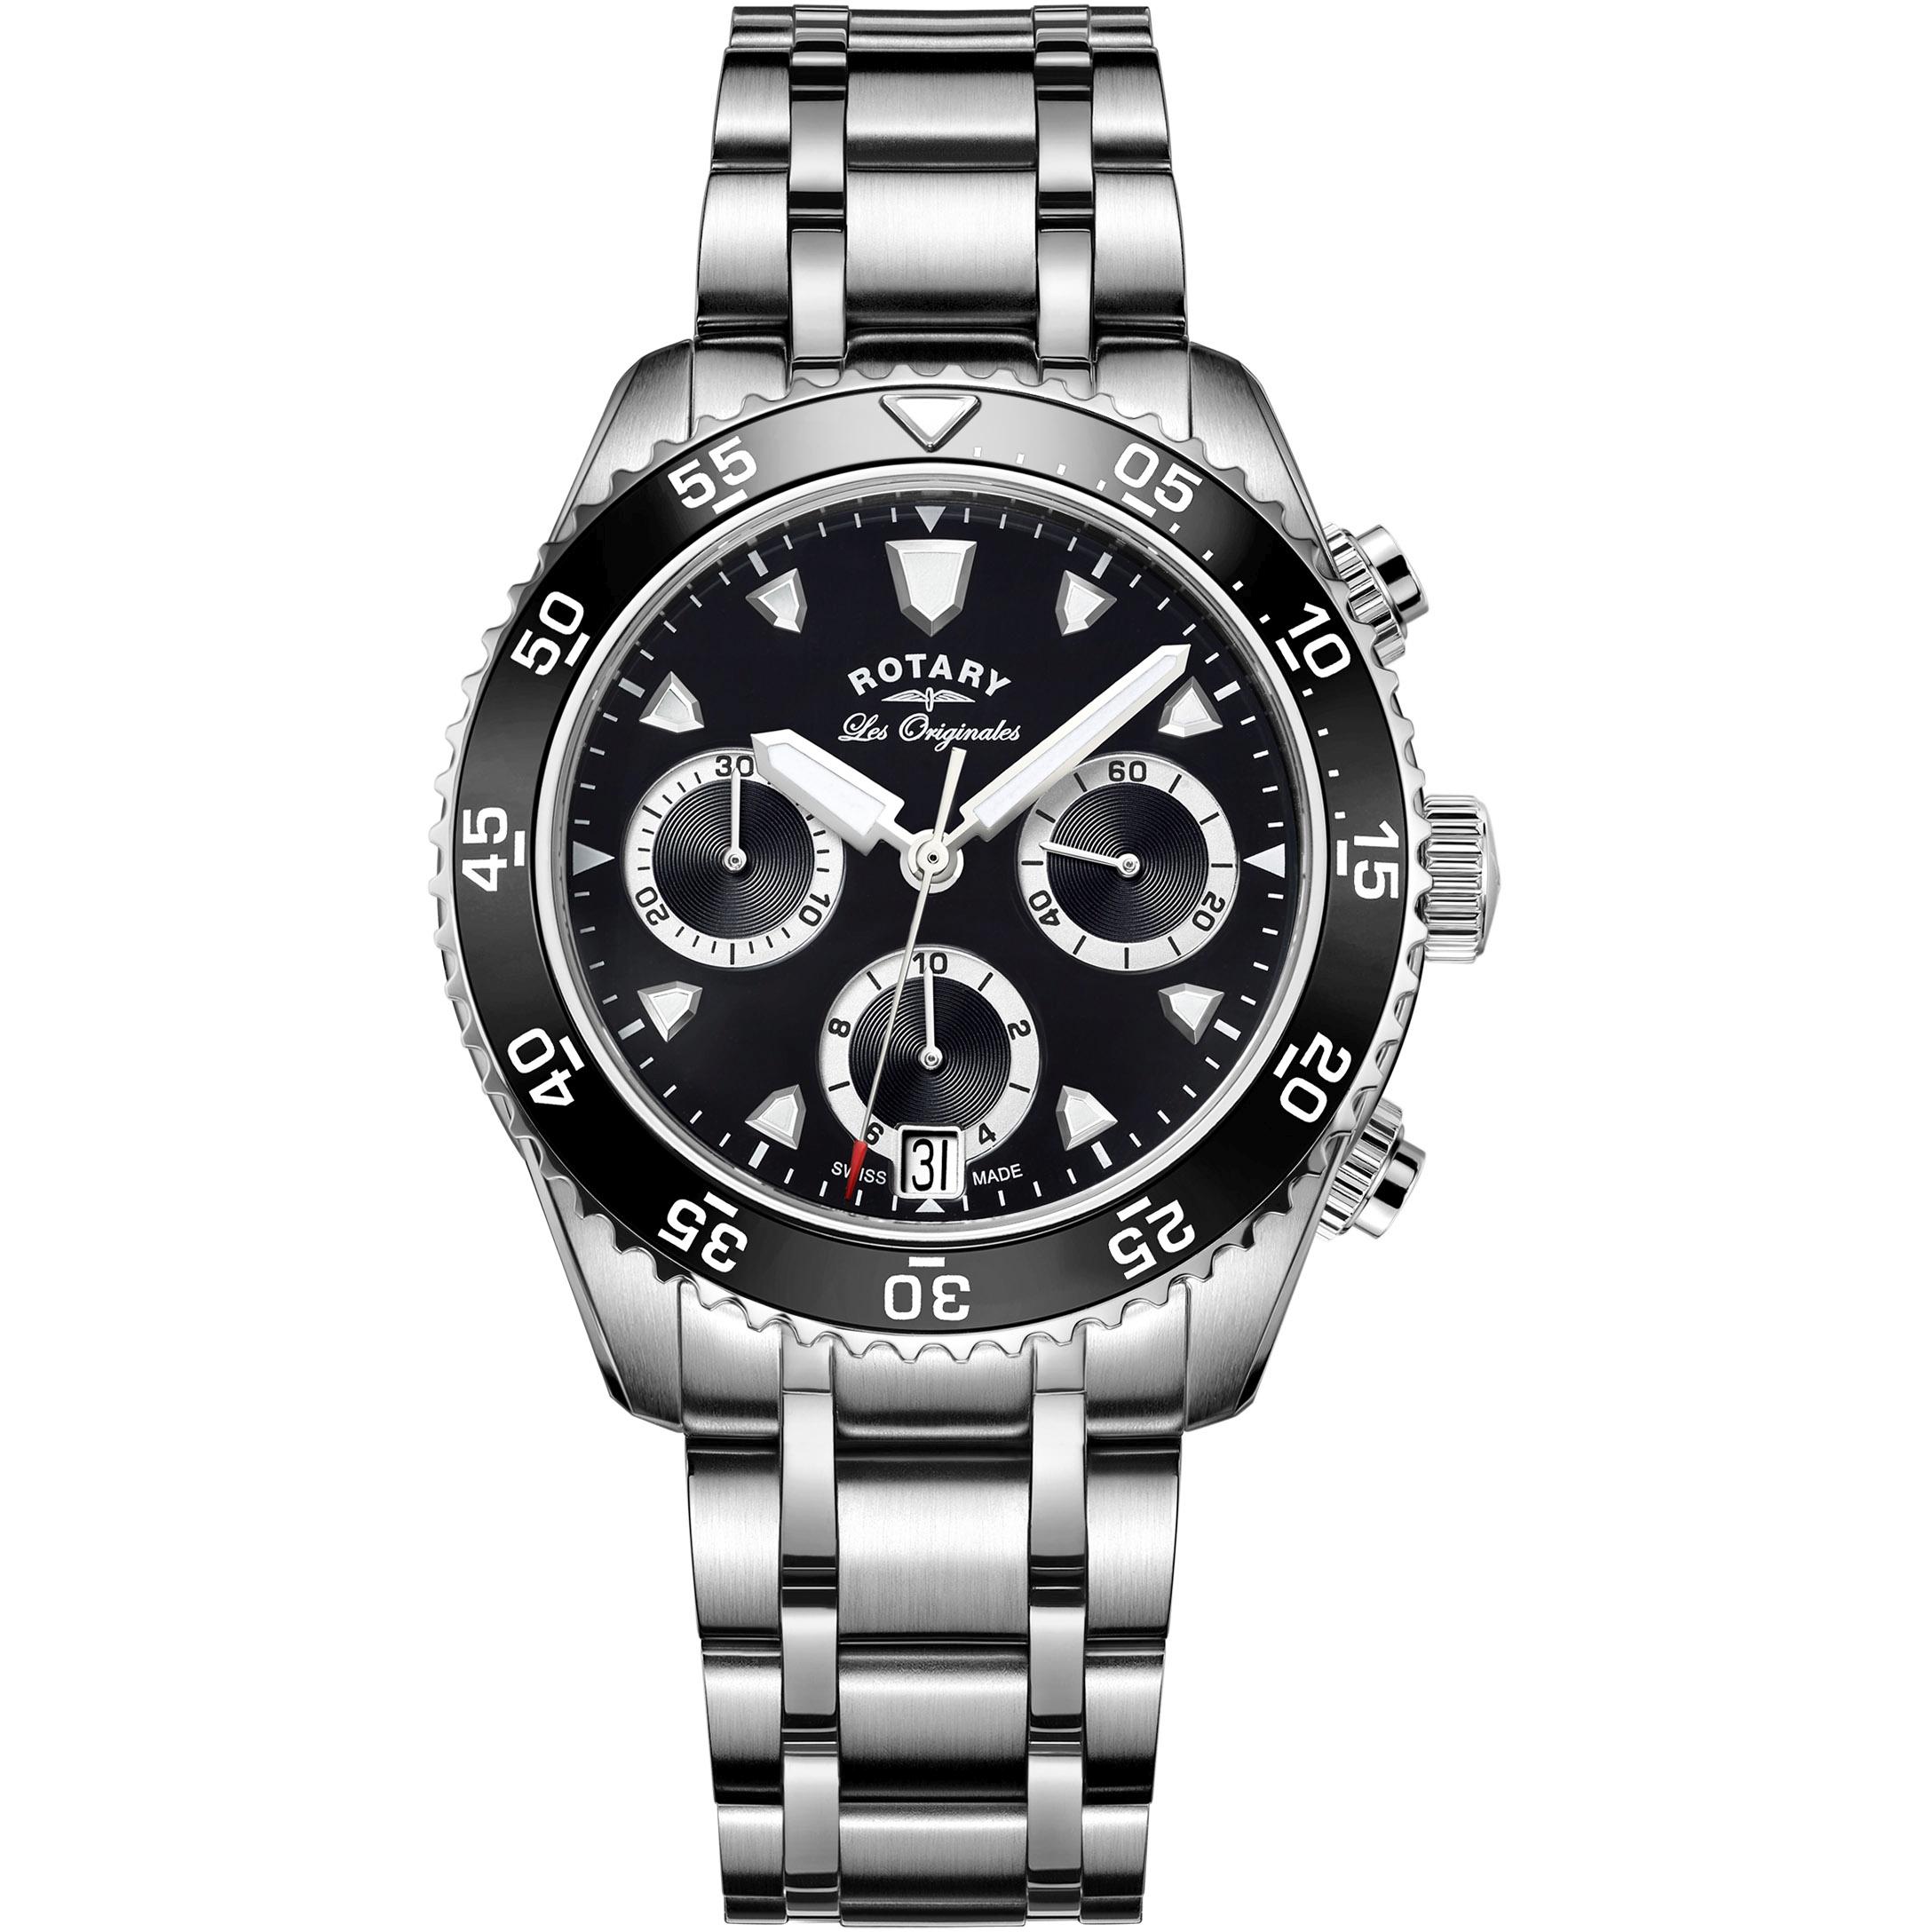 f4126542cf78 Gents Rotary Swiss Made Legacy Dive Quartz Chronograph Watch (GB90170 04)